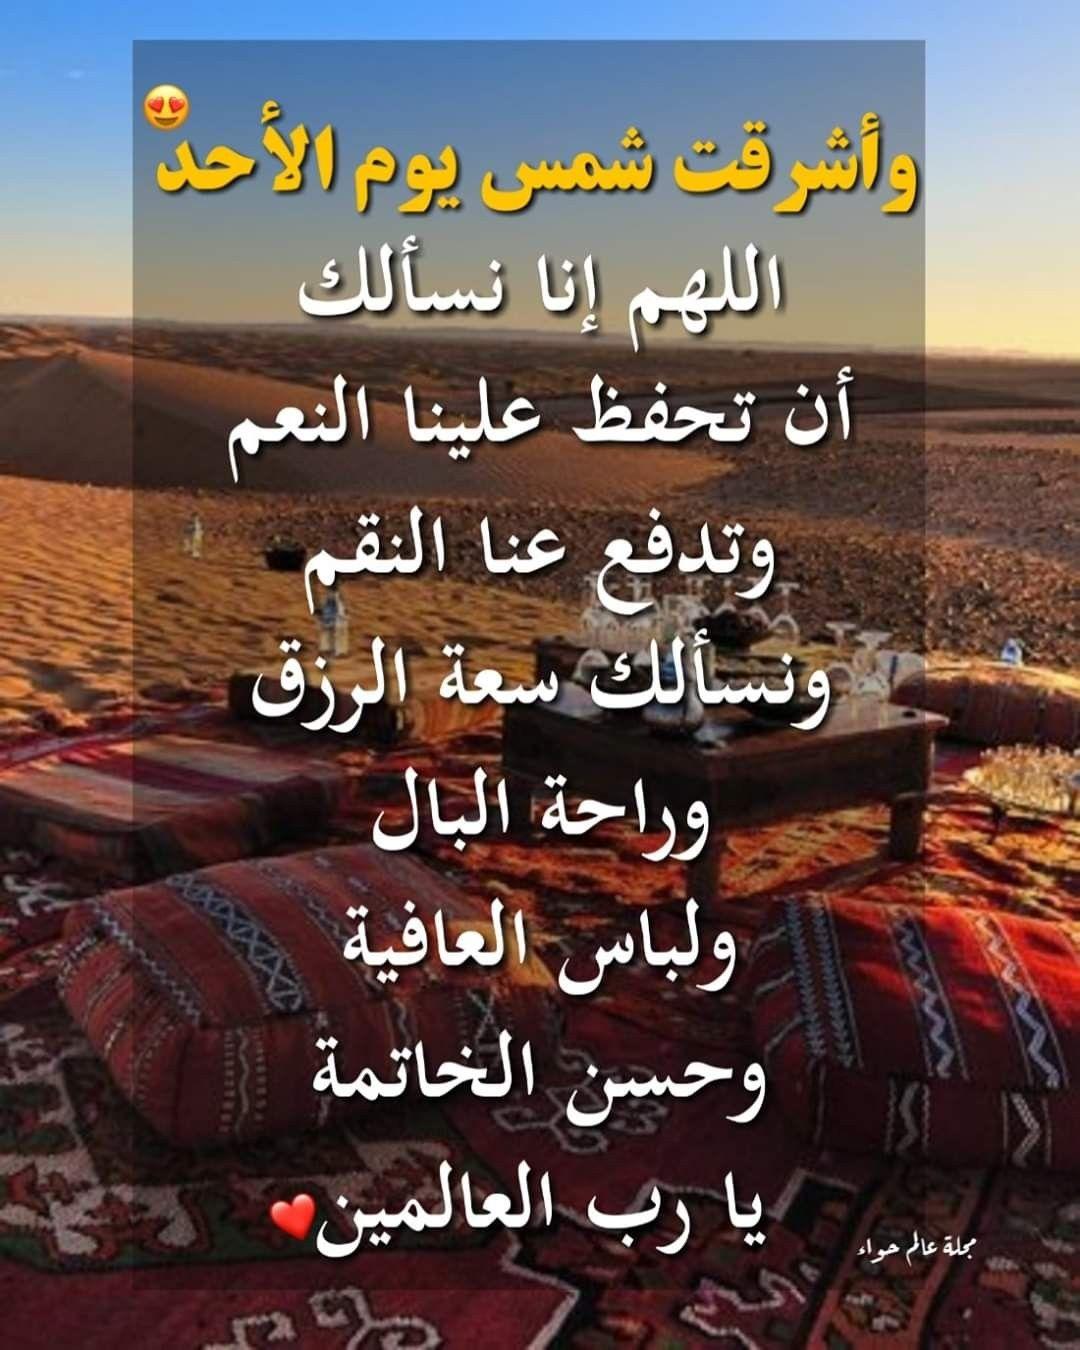 Pin By Chamsdine Chams On صباح مساء الخير Arabic Calligraphy